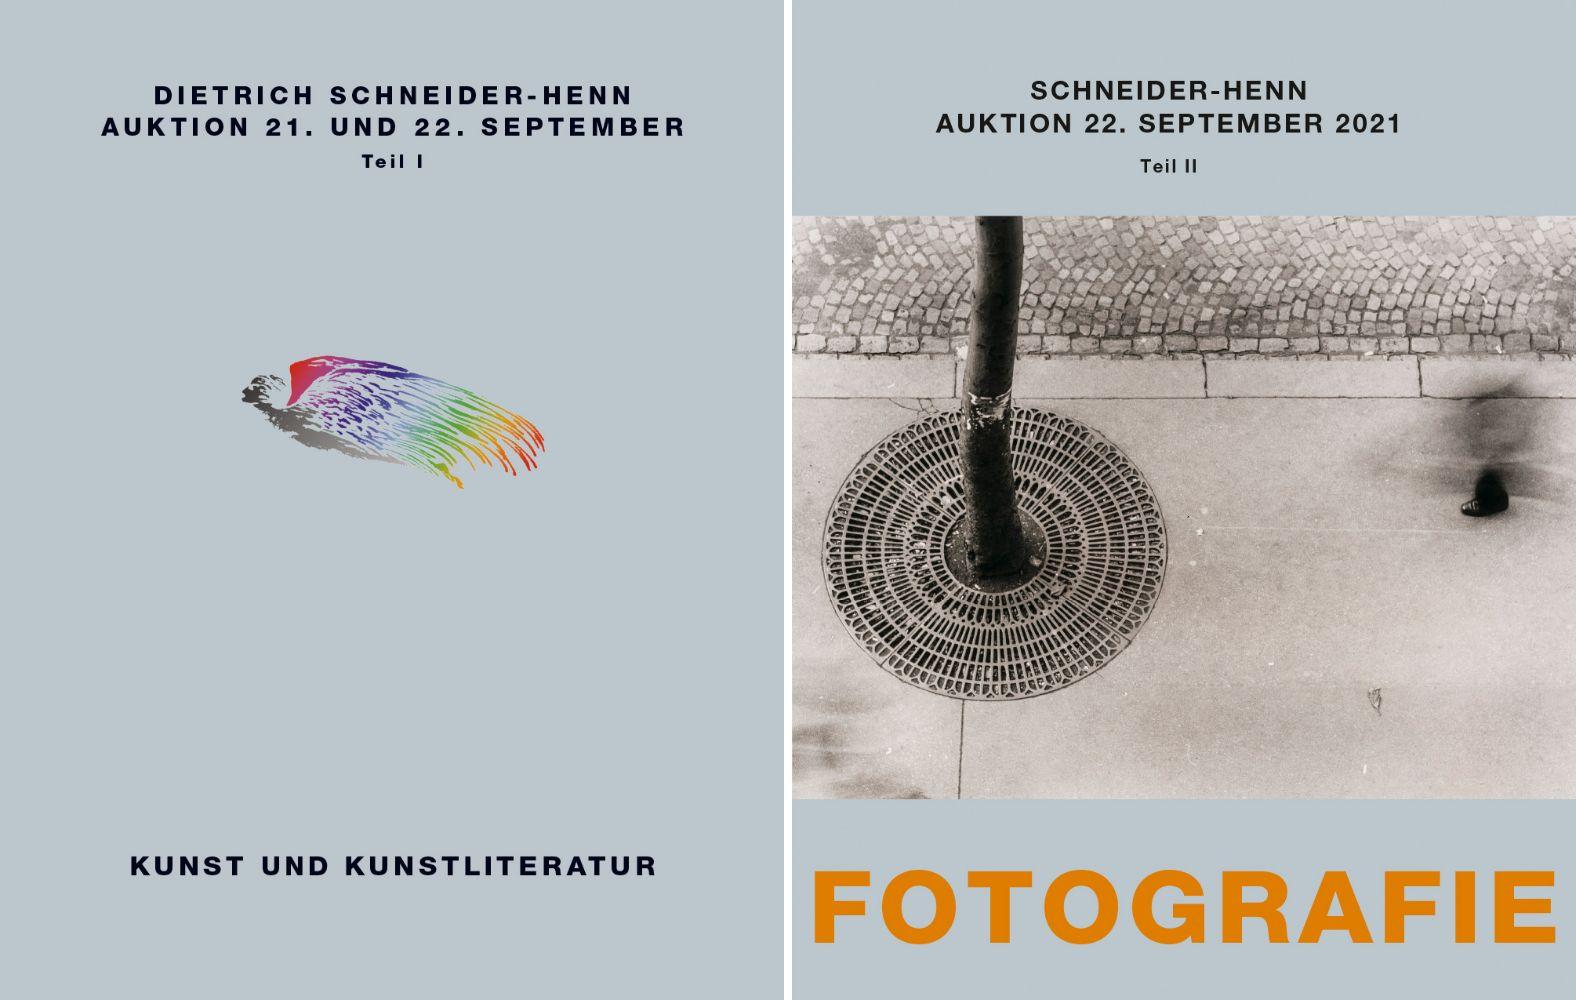 Fotografie, Kunstliteratur, Kunst 21./22. September